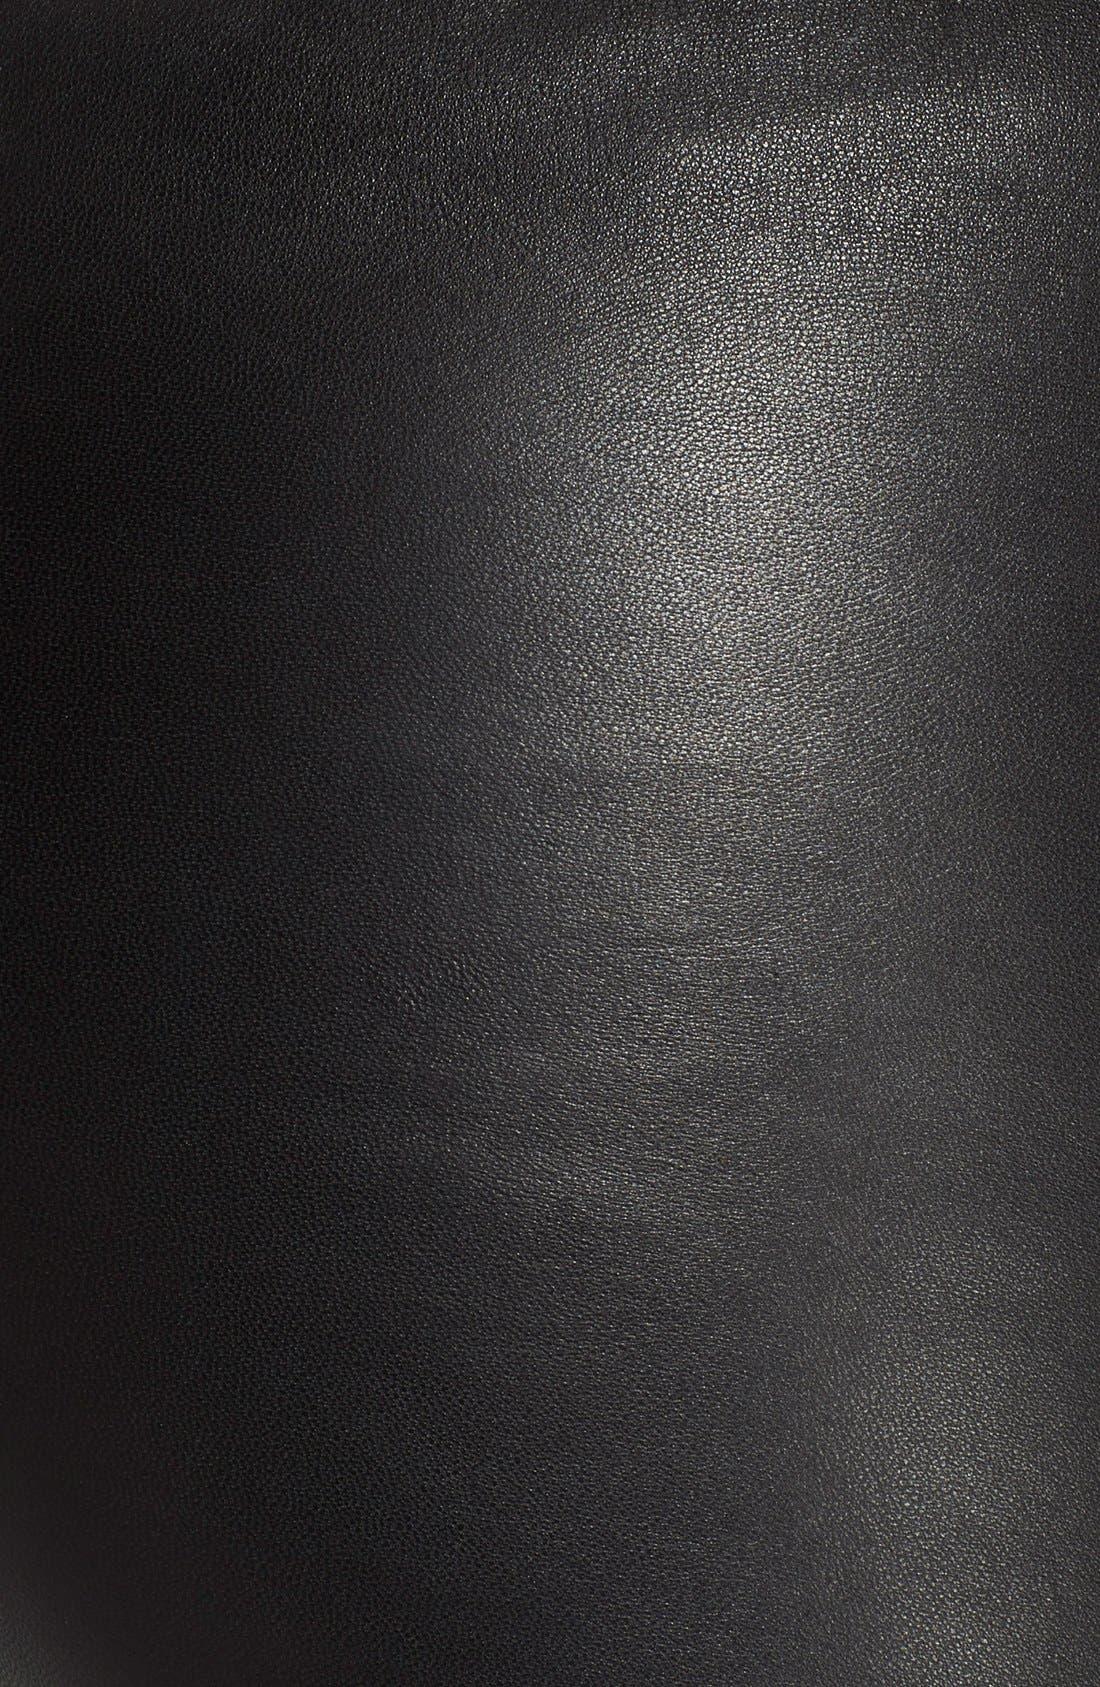 Alternate Image 3  - Rick Owens Stretch Leather Leggings